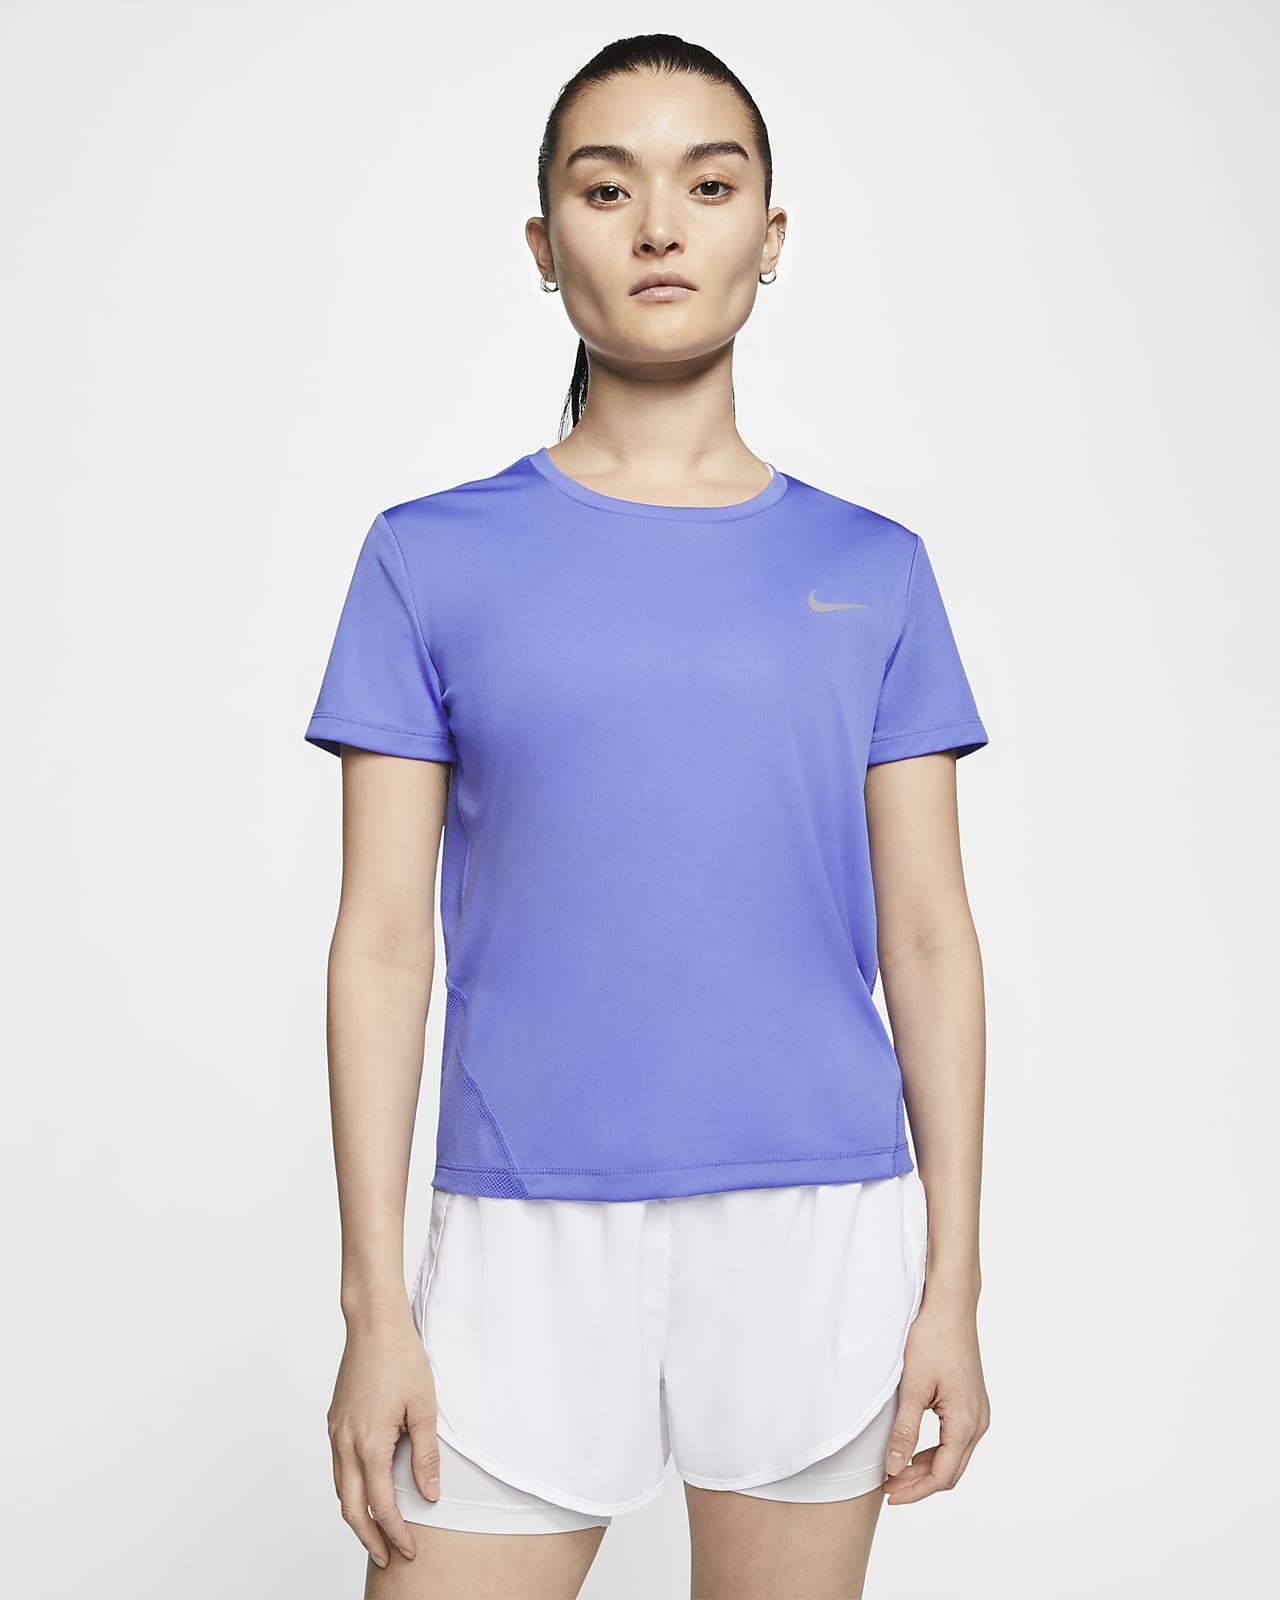 Nike Miler Women's Short-Sleeve Running Top